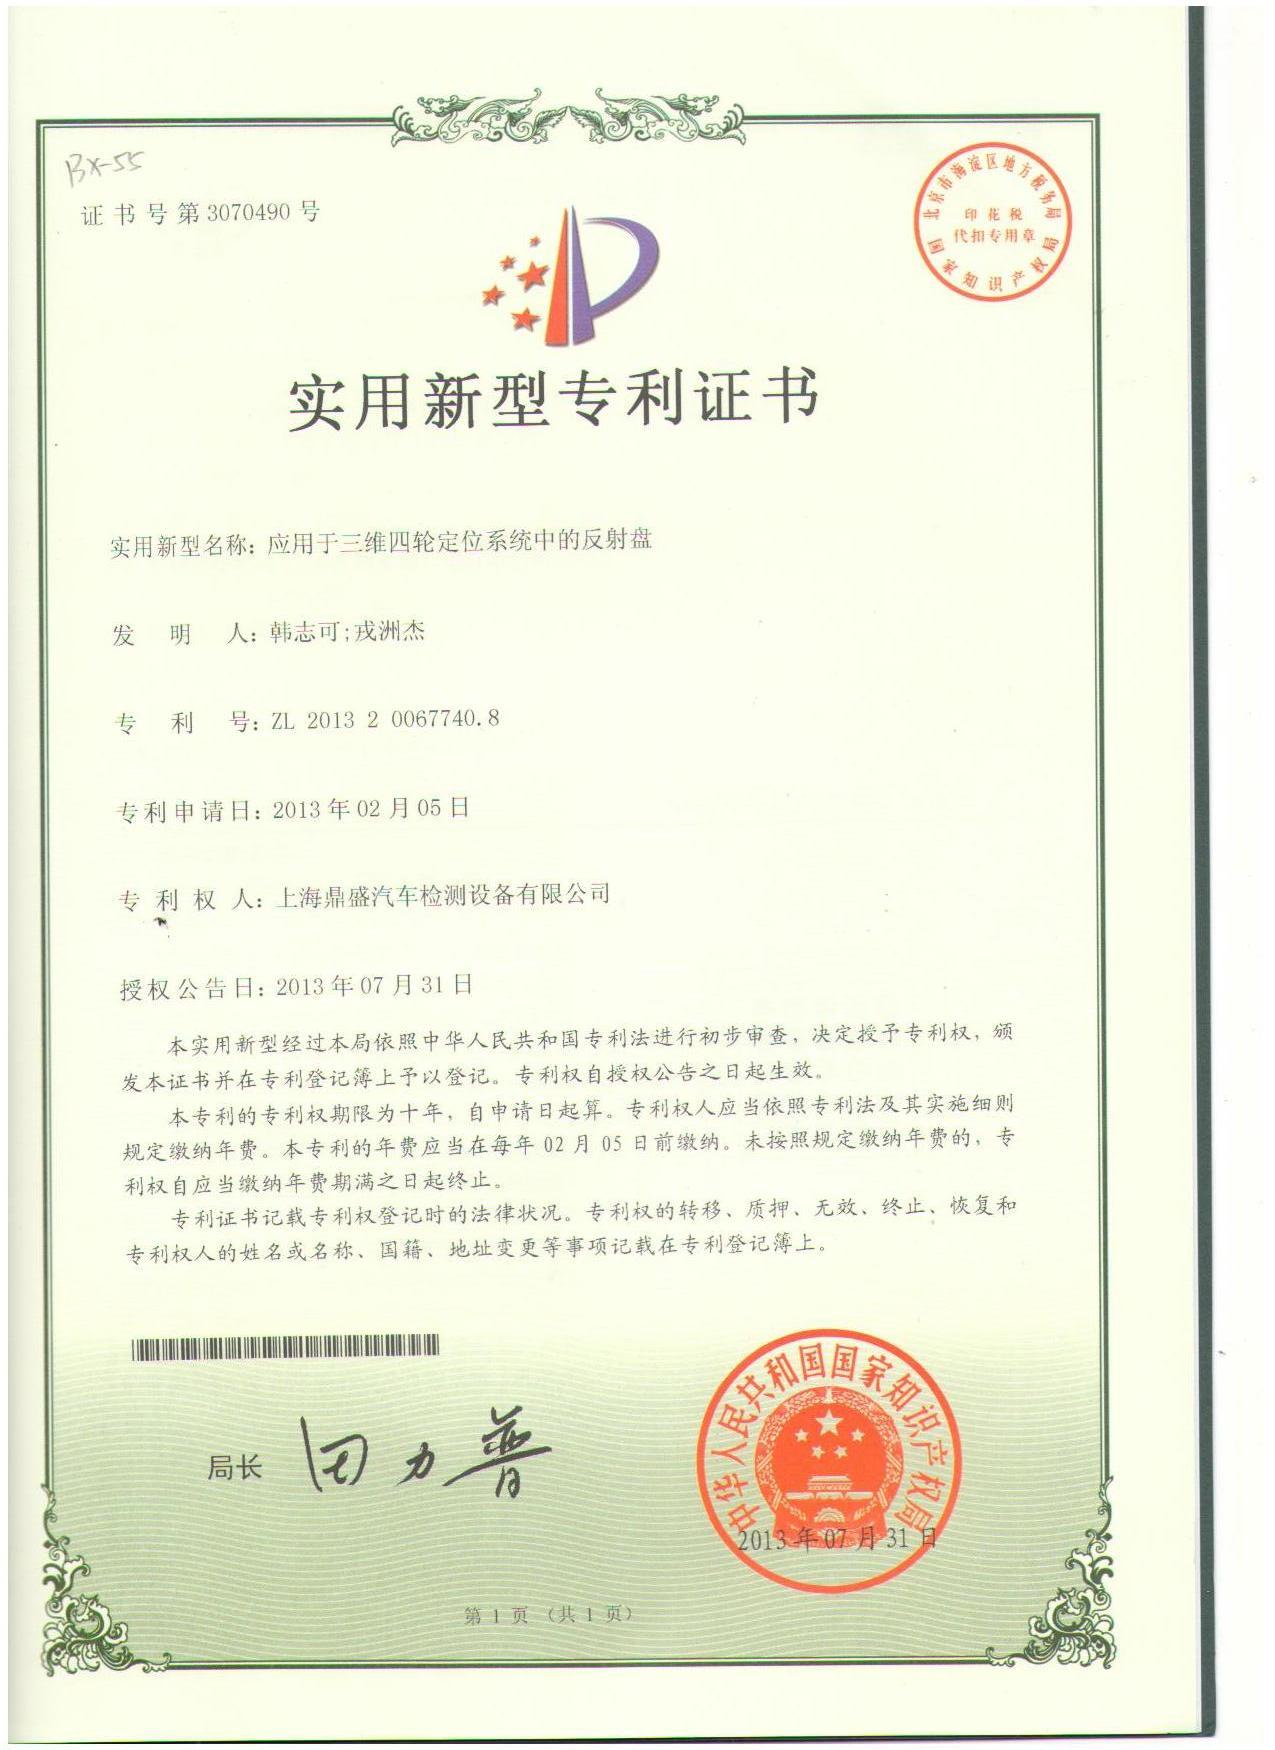 copy right certificate